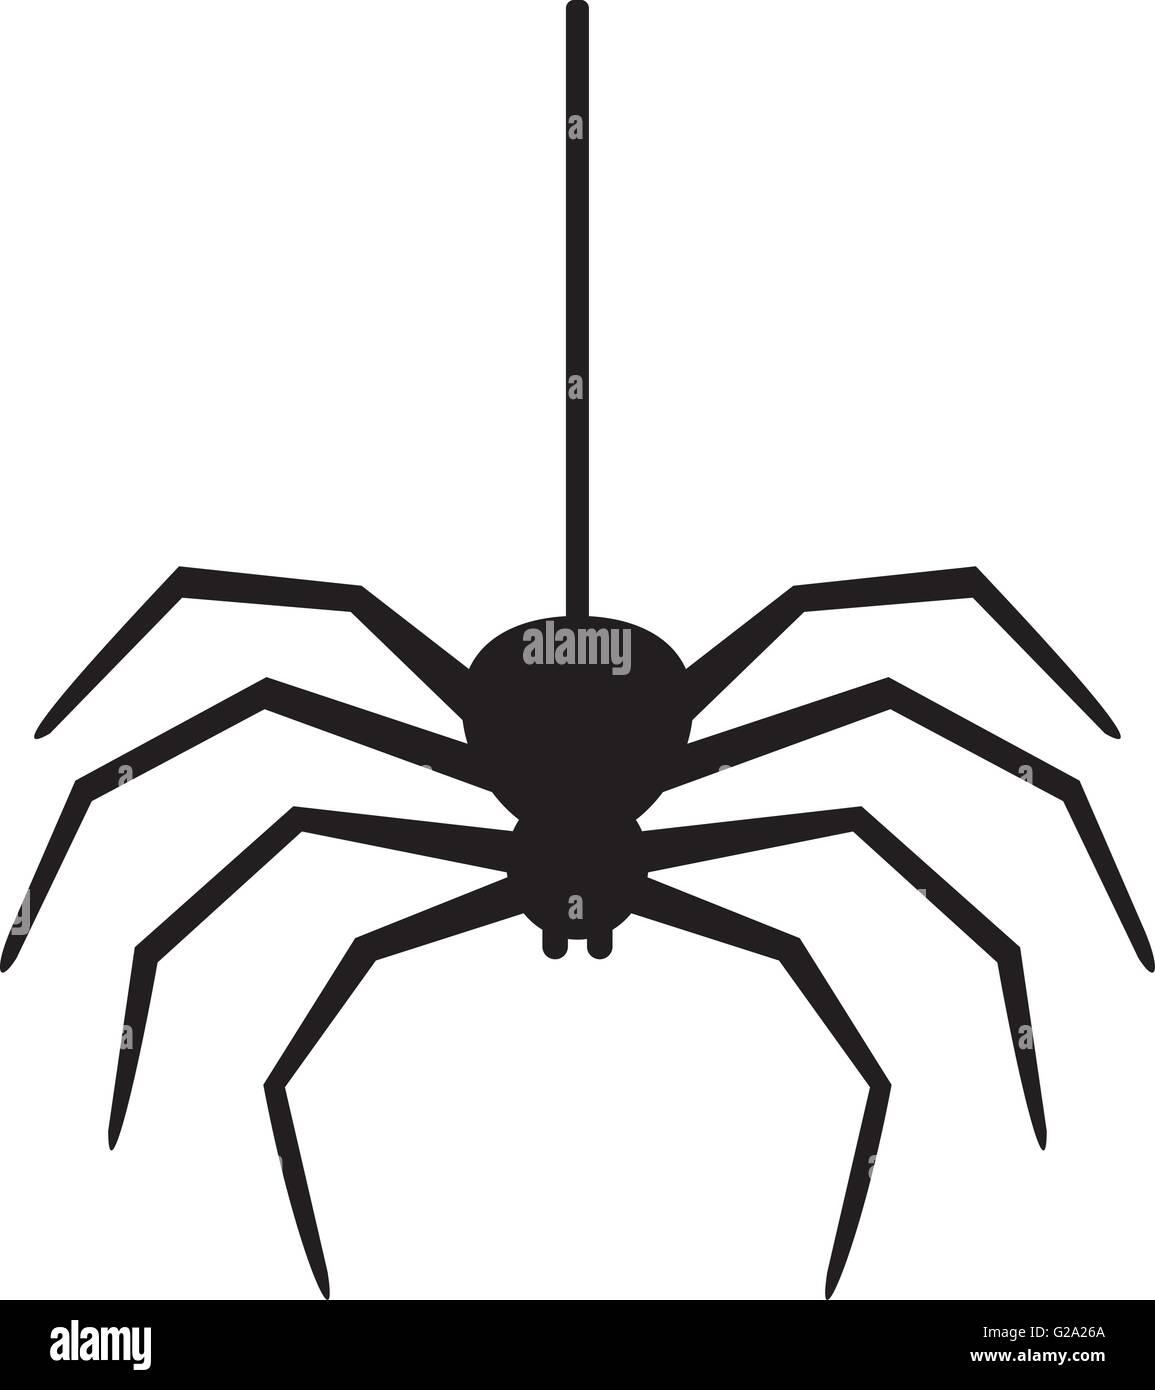 Spider hanging on a thread Stock Vector Art & Illustration ...